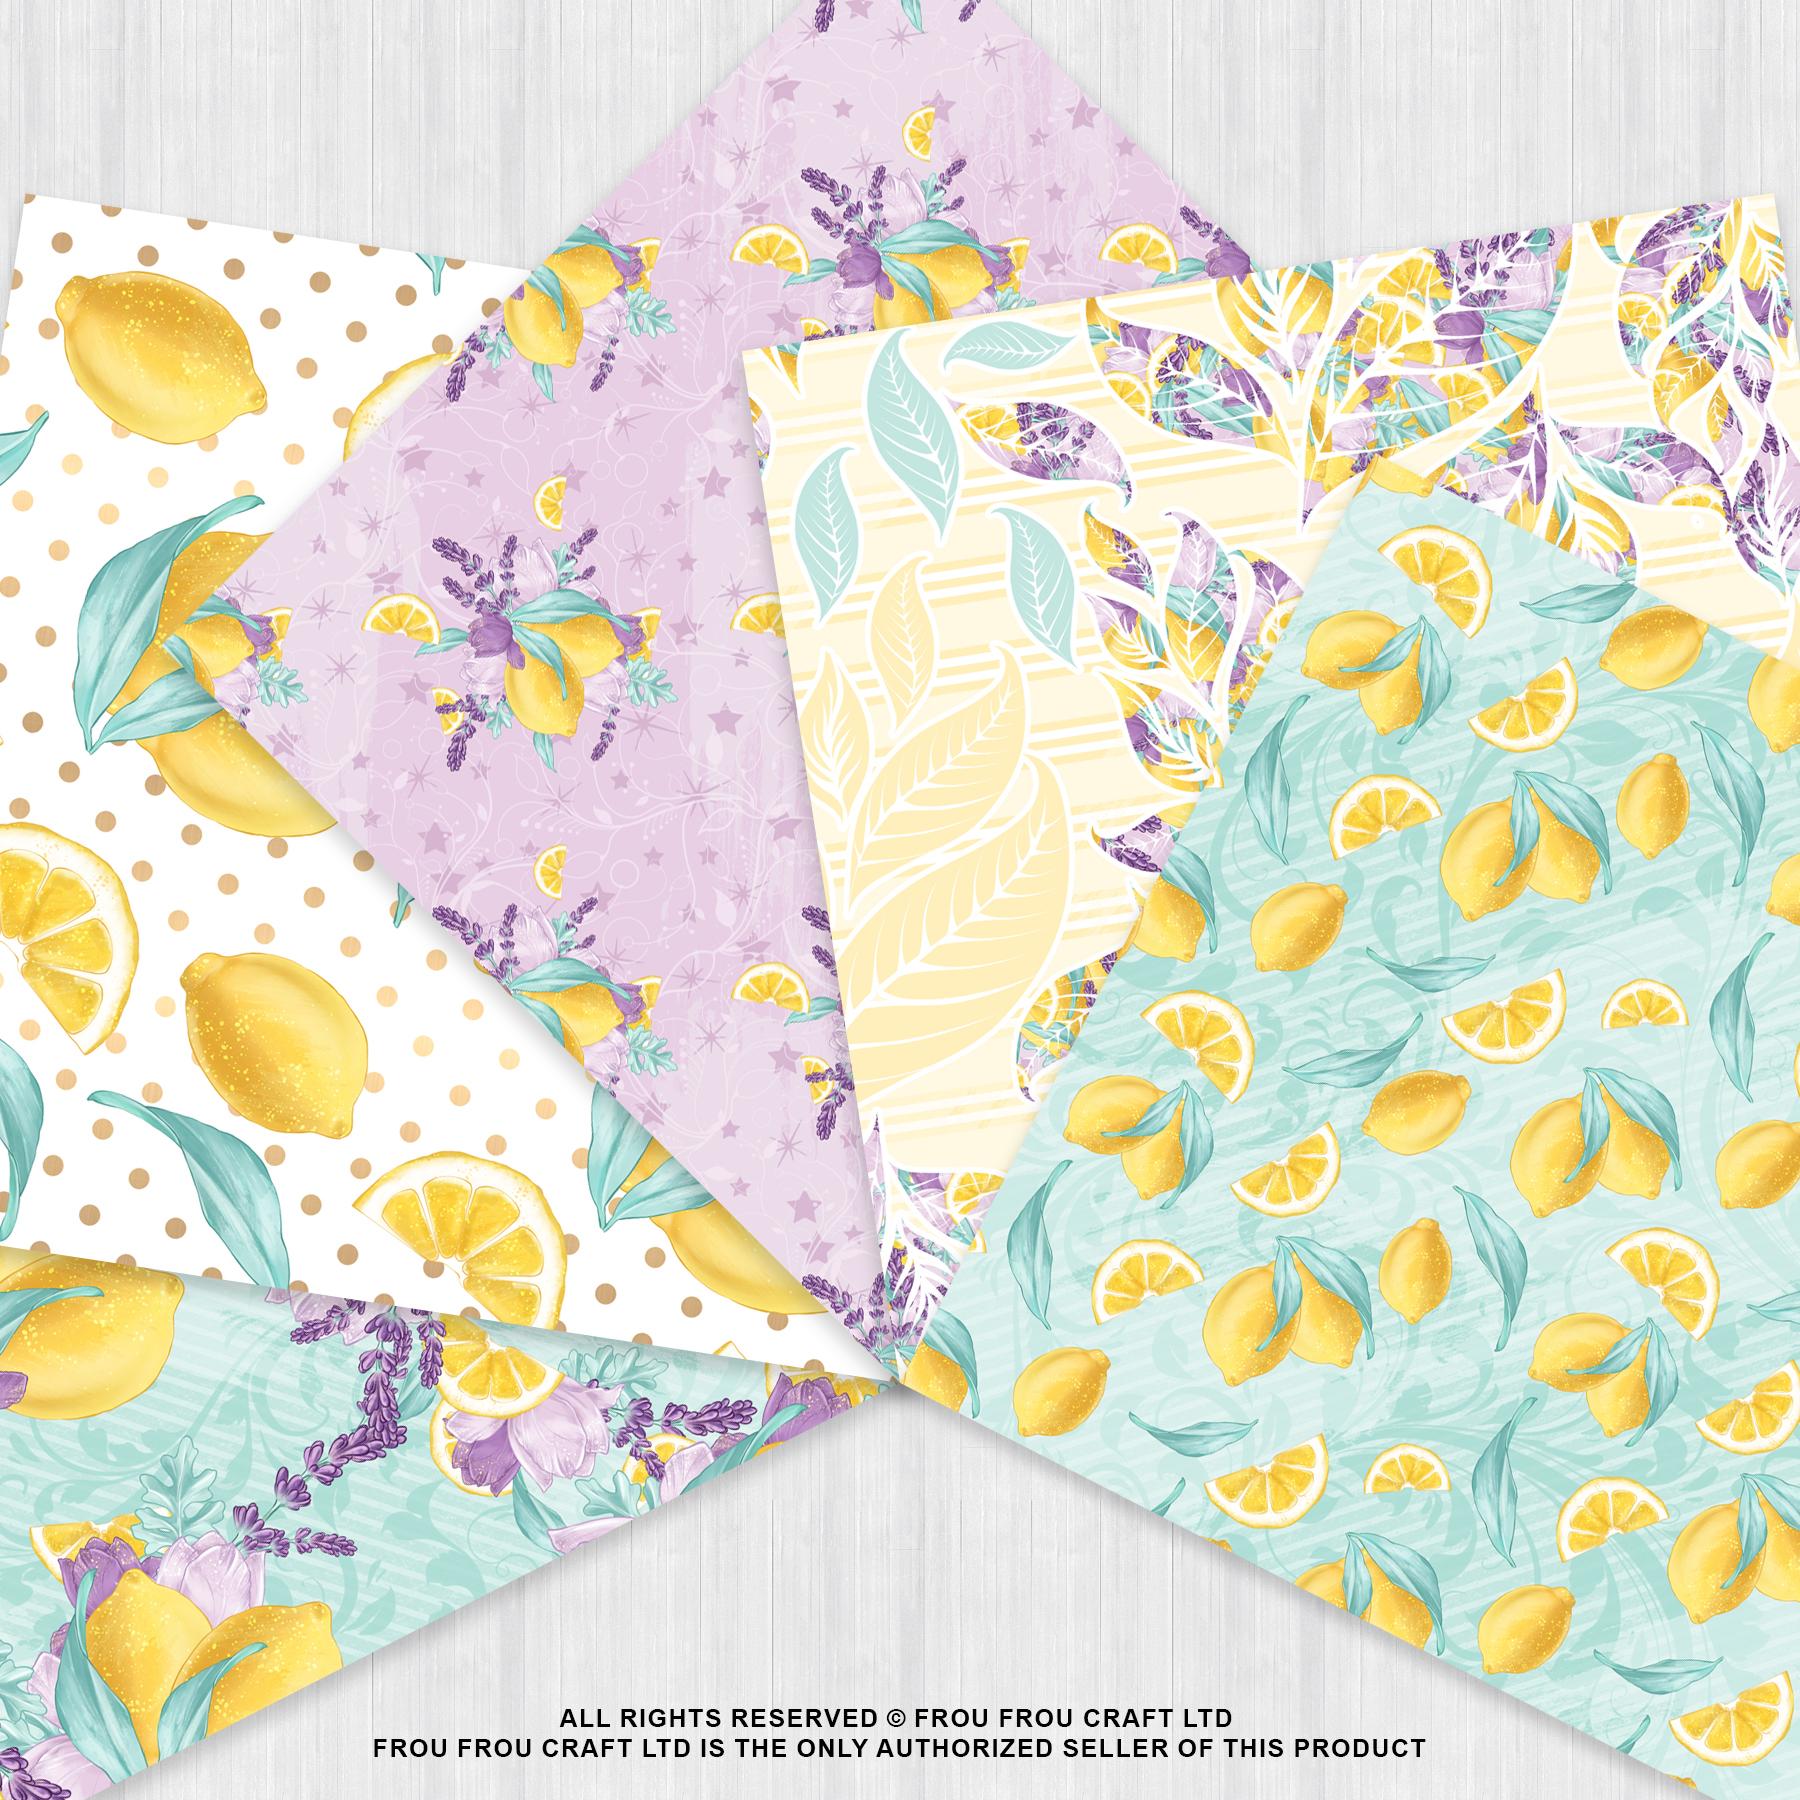 Lemons Fruits Lavender Citrus Summer Paper Pack example image 3